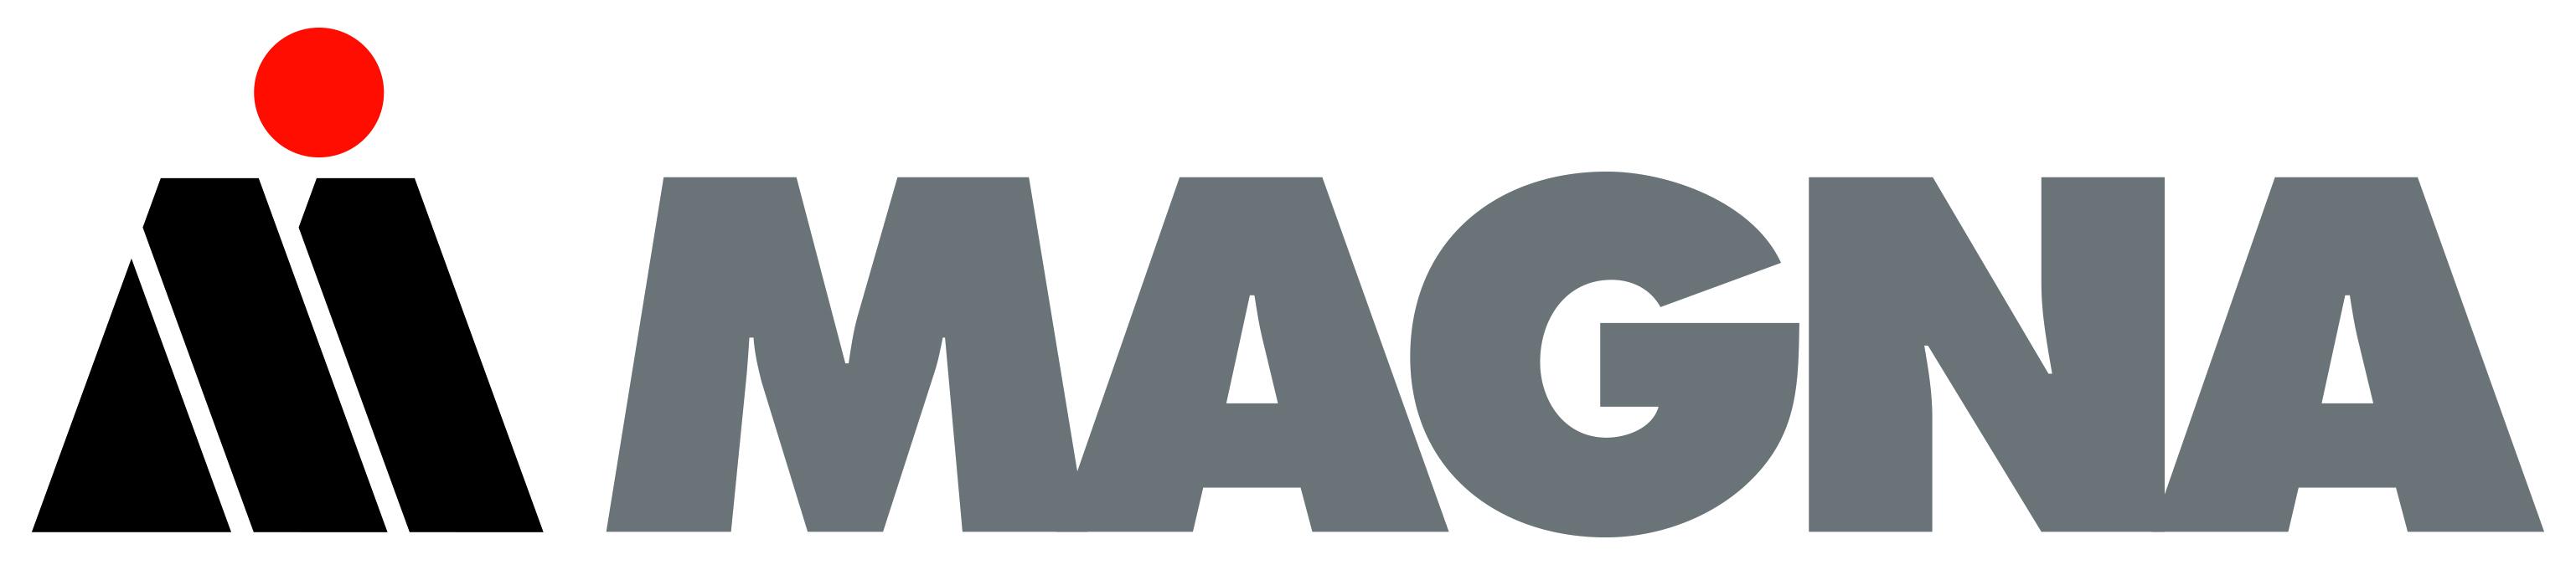 Logo: MAGNA STEYR Fahrzeugtechnik AG & Co KG